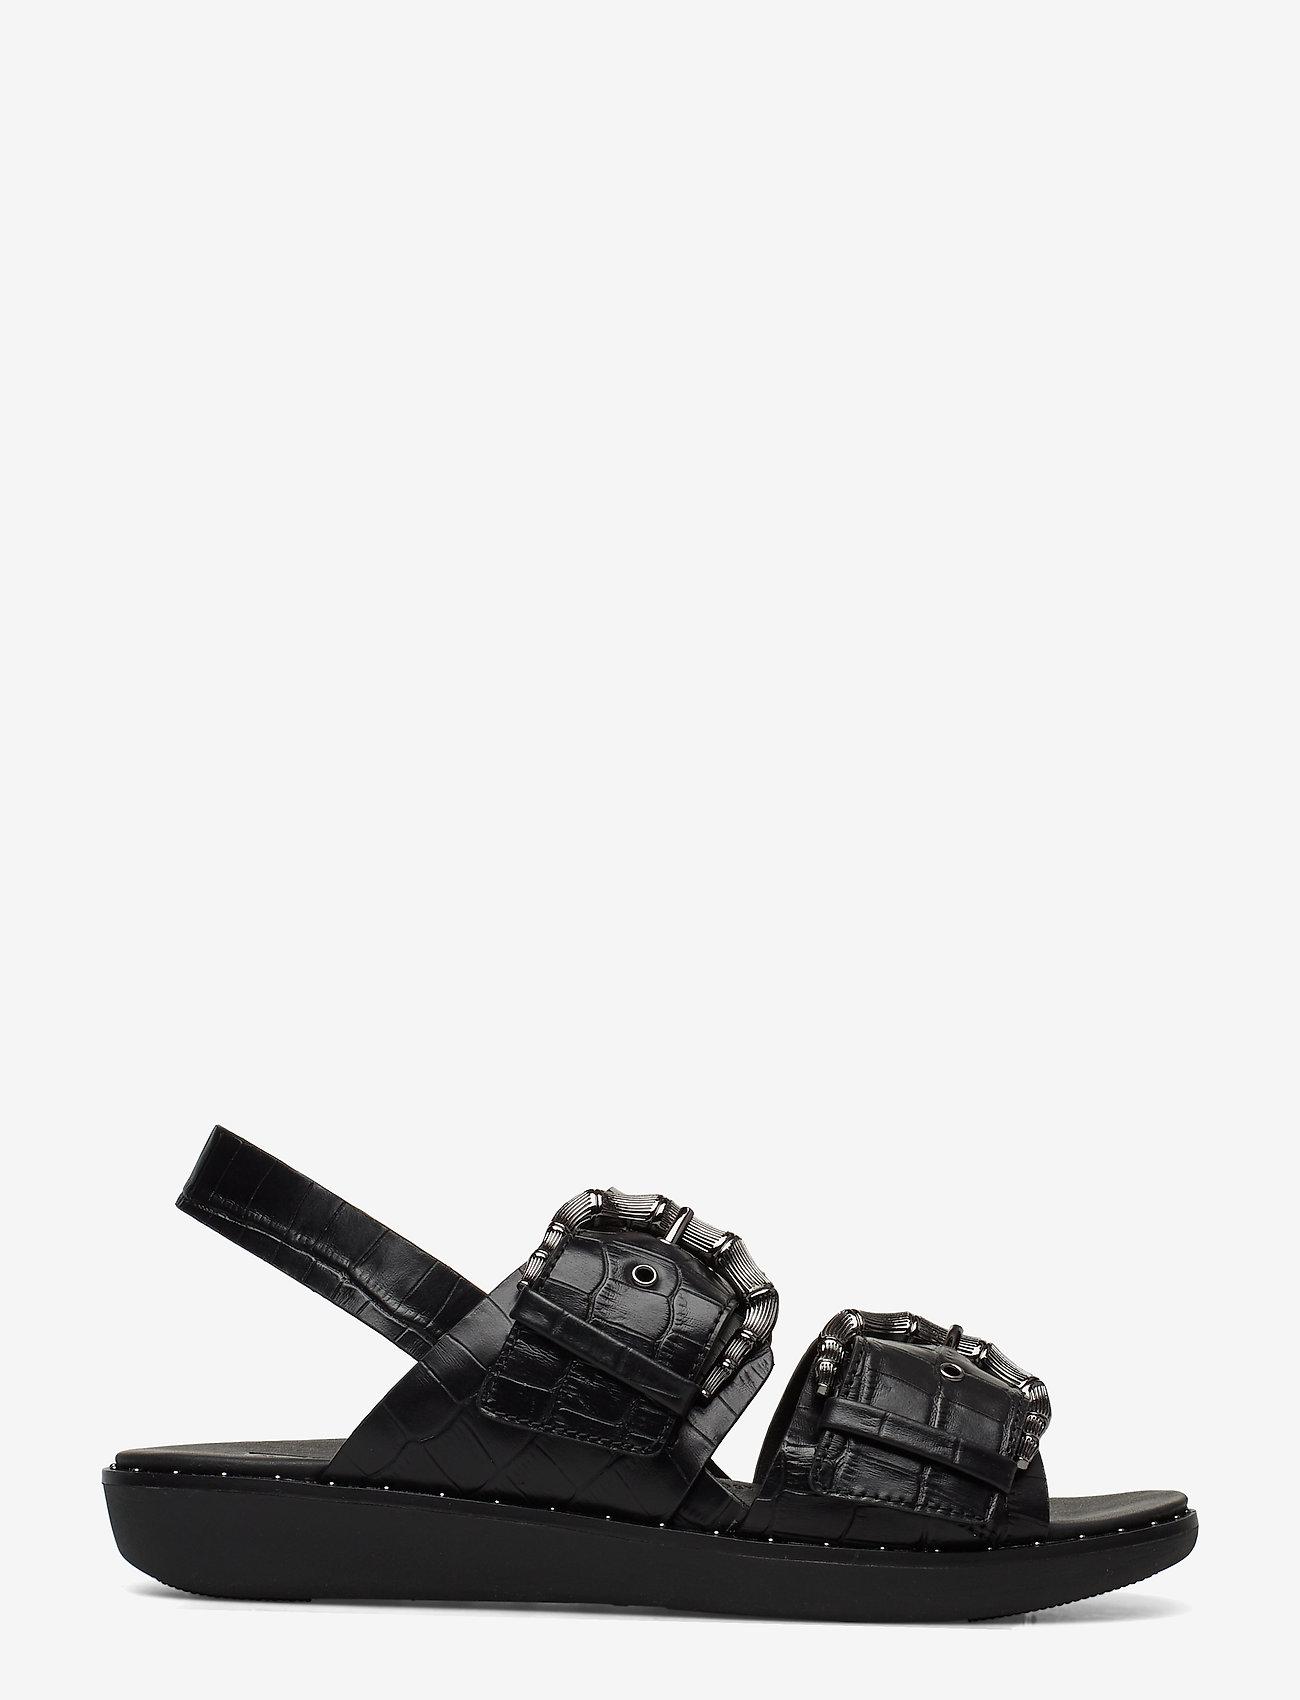 Kaia Croc Print Back-strap Sandals (Black) - FitFlop